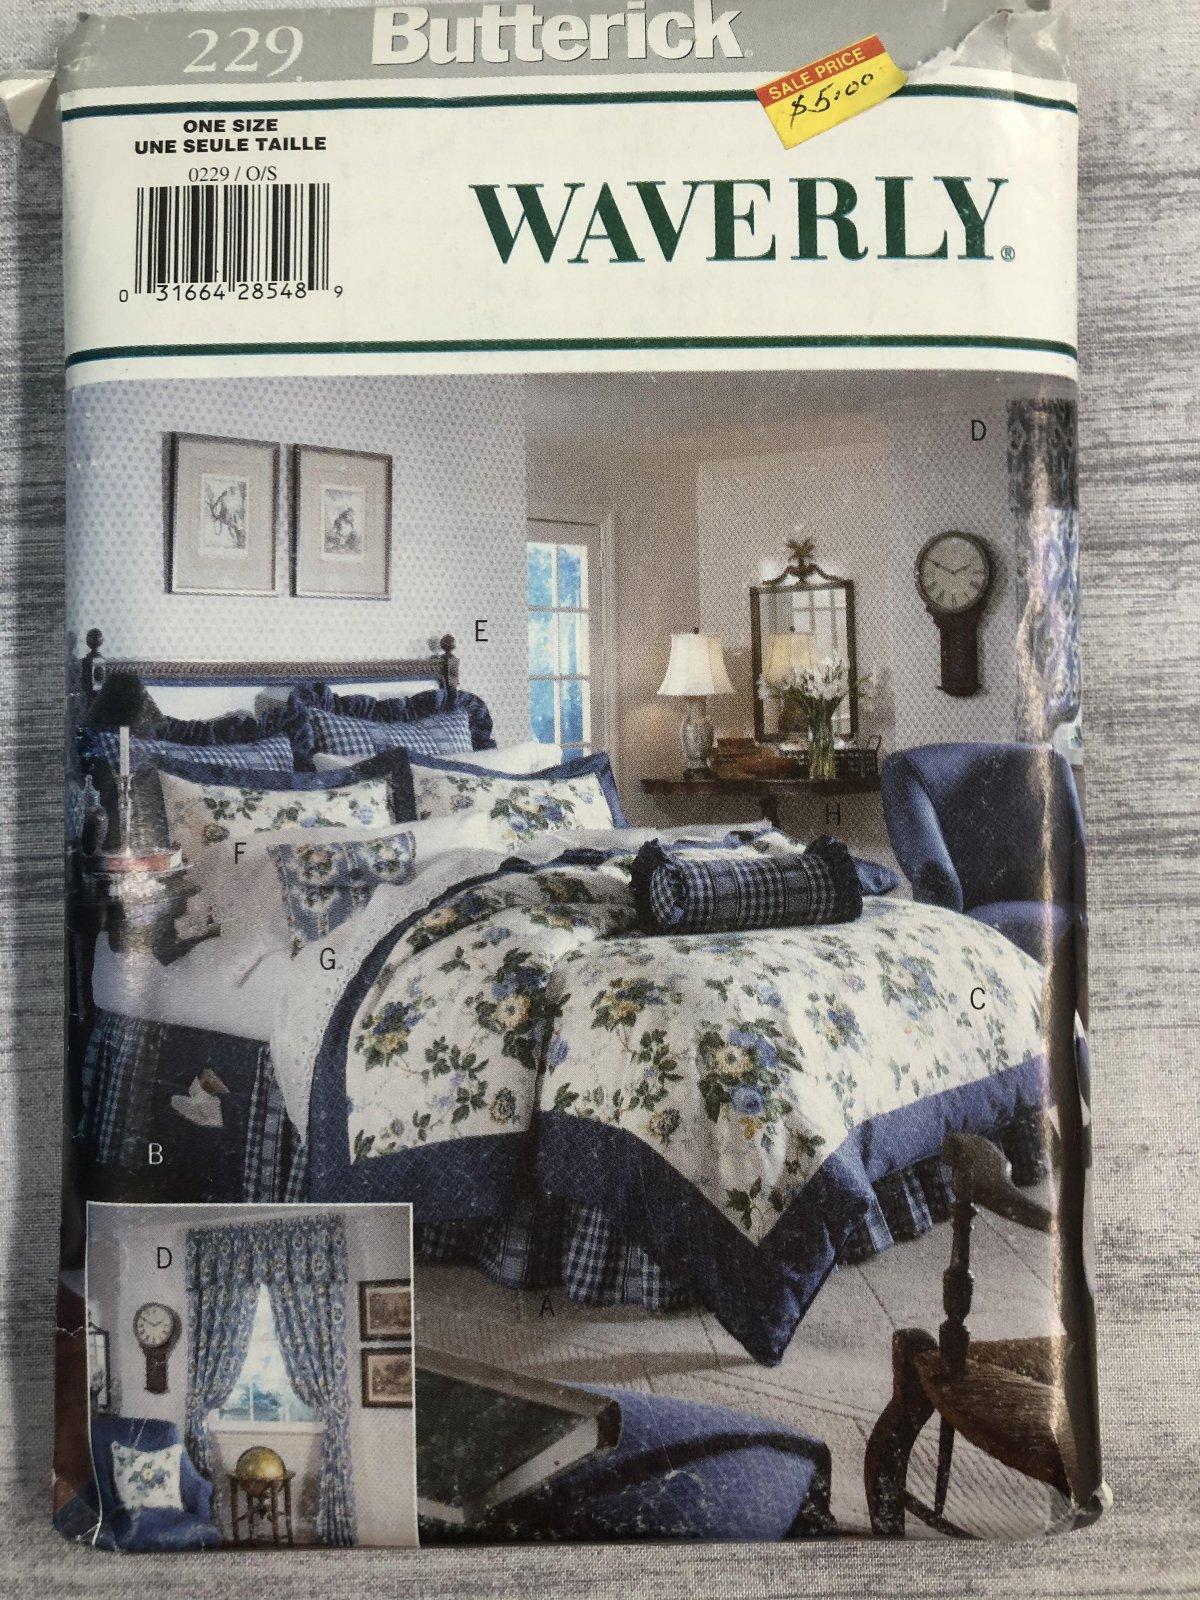 Butterick Waverly 0229